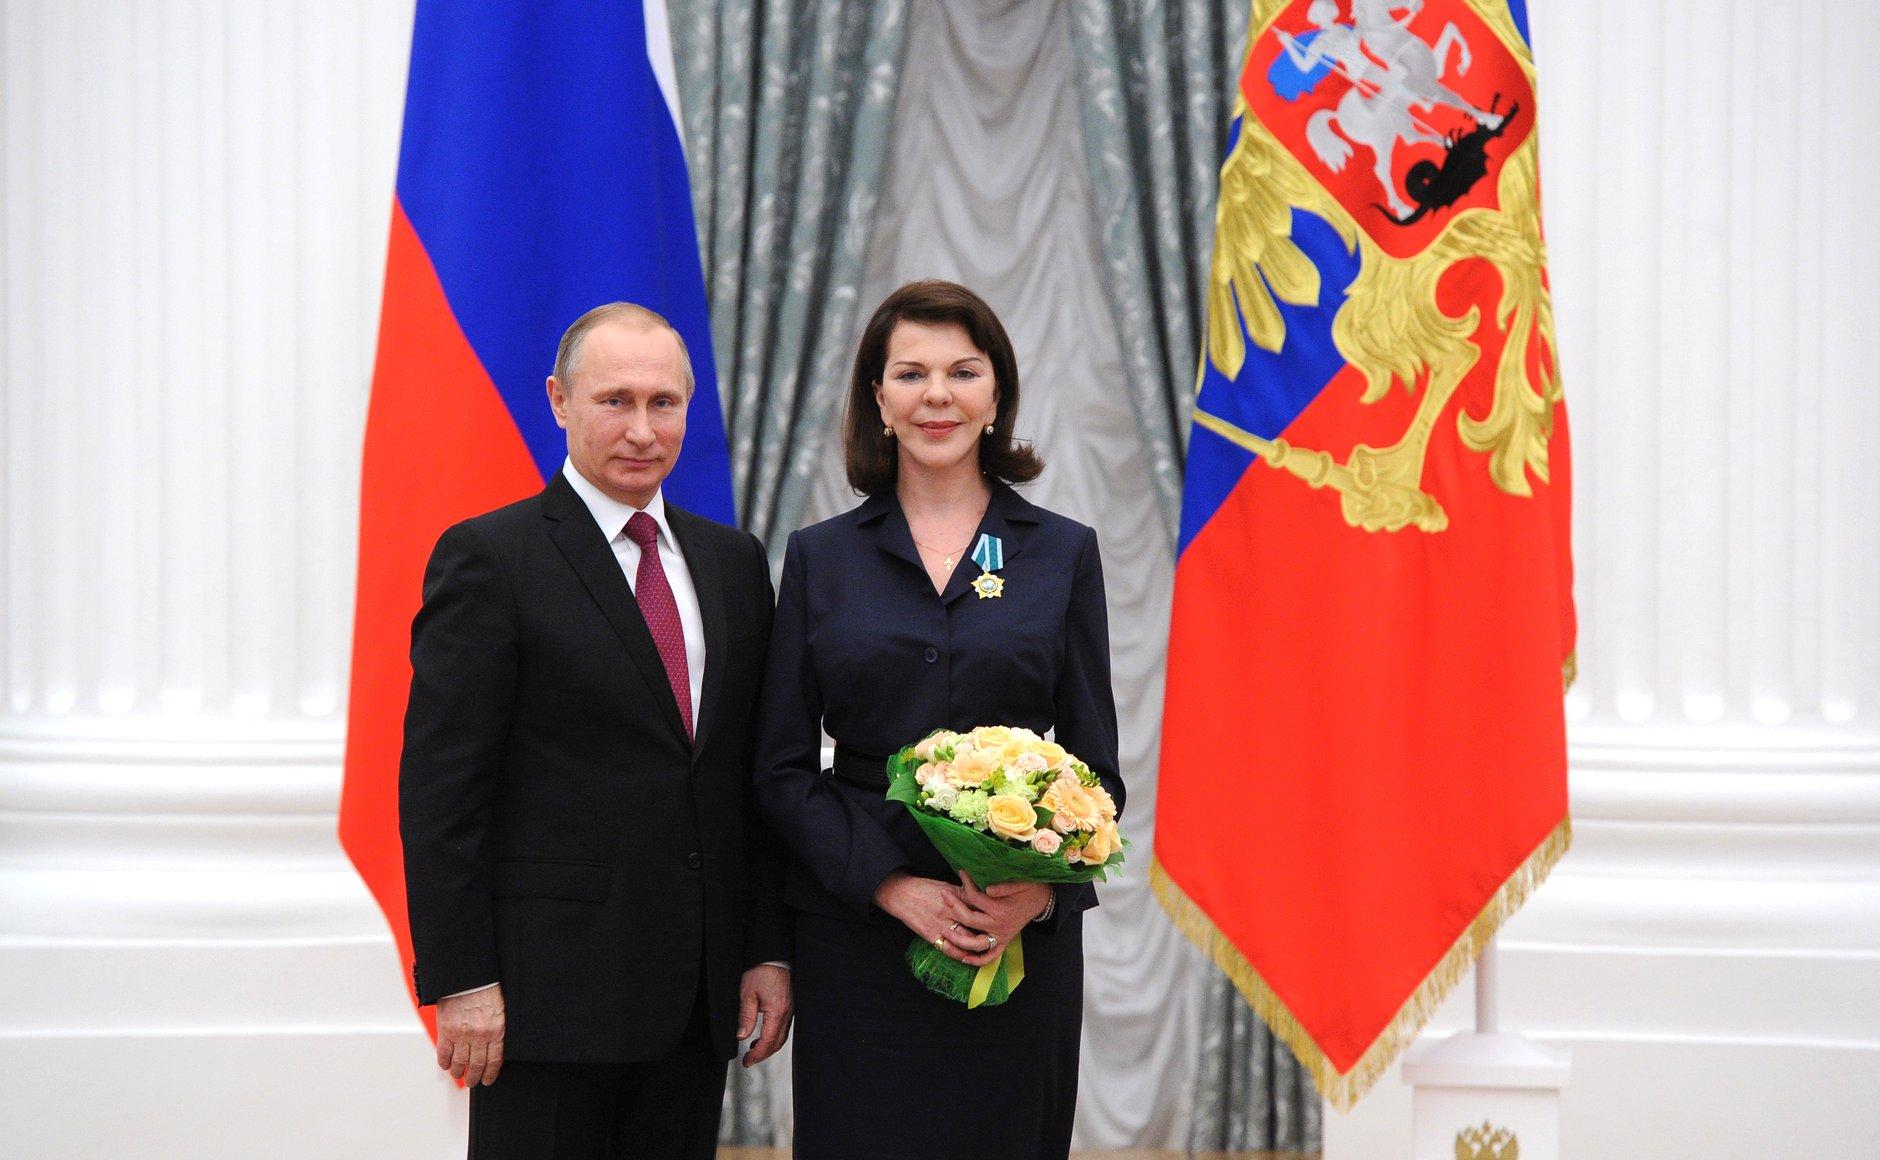 На фото Владимир Путин и Консуэло Де Авиланд